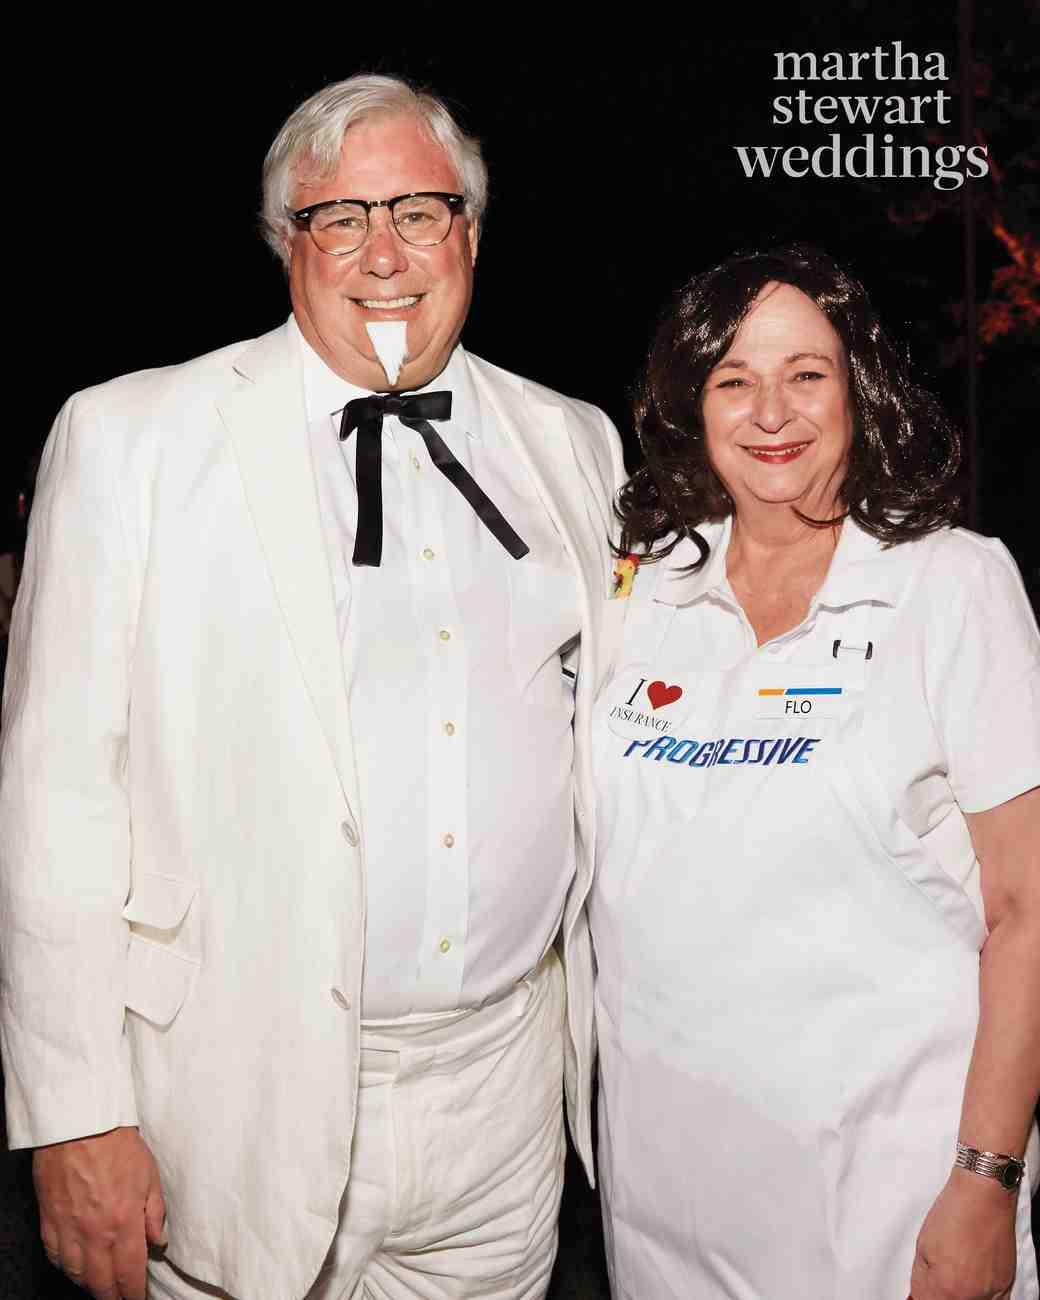 jamie-bryan-wedding-11-costume-party-parents-0779-d112664.jpg